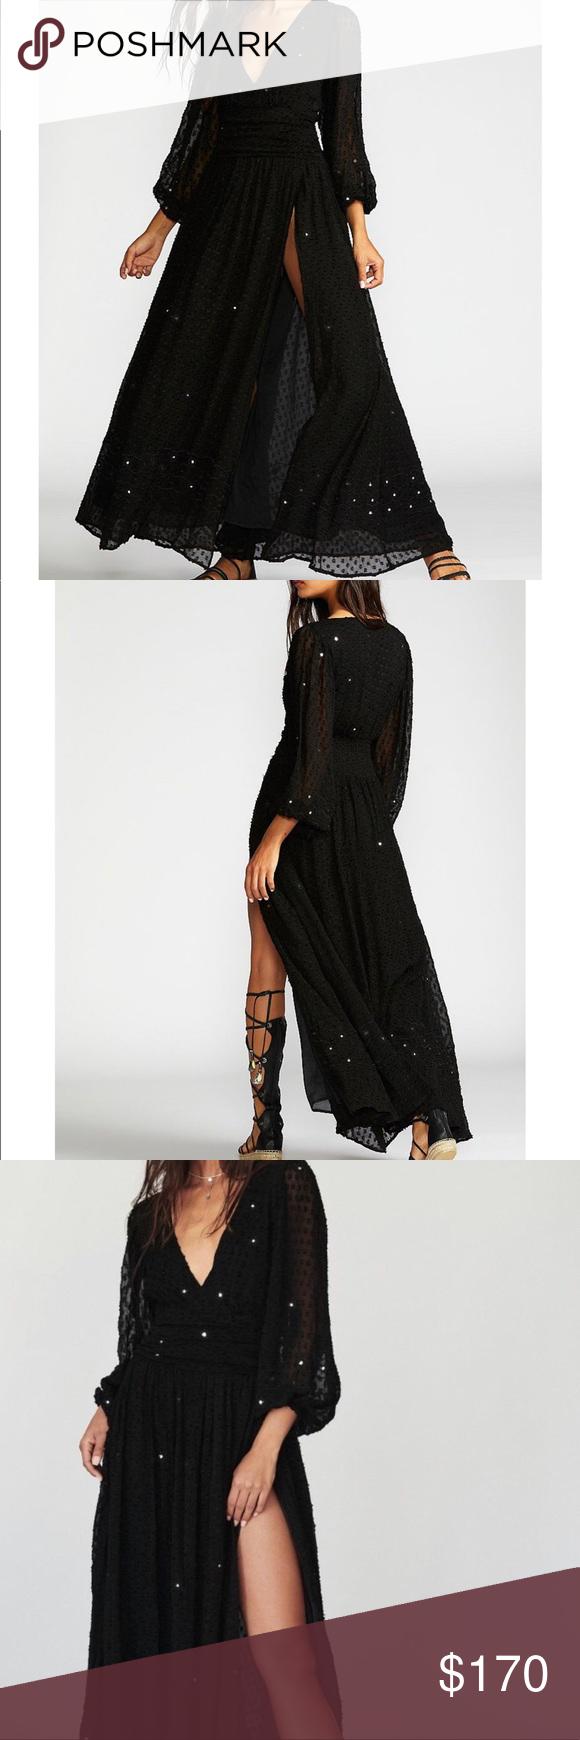 Nwt free people embellished lapis maxi dress xs nwt my posh picks